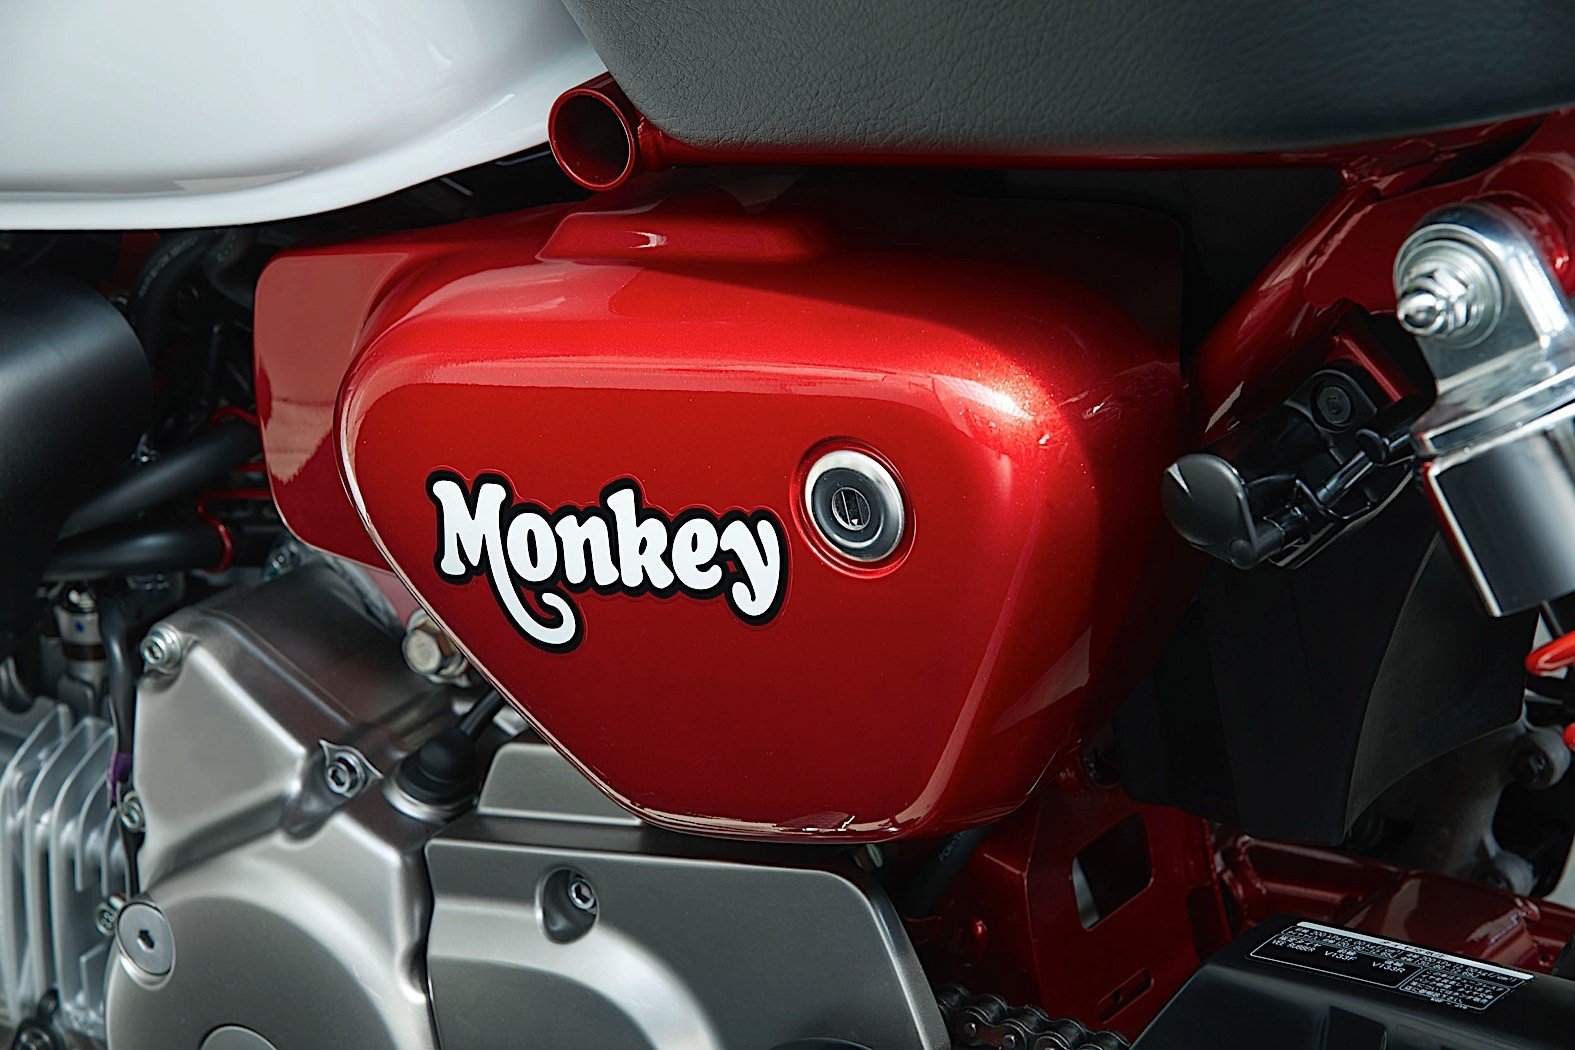 2019 Honda Monkey, Super Cub Come to the U.S. - autoevolution